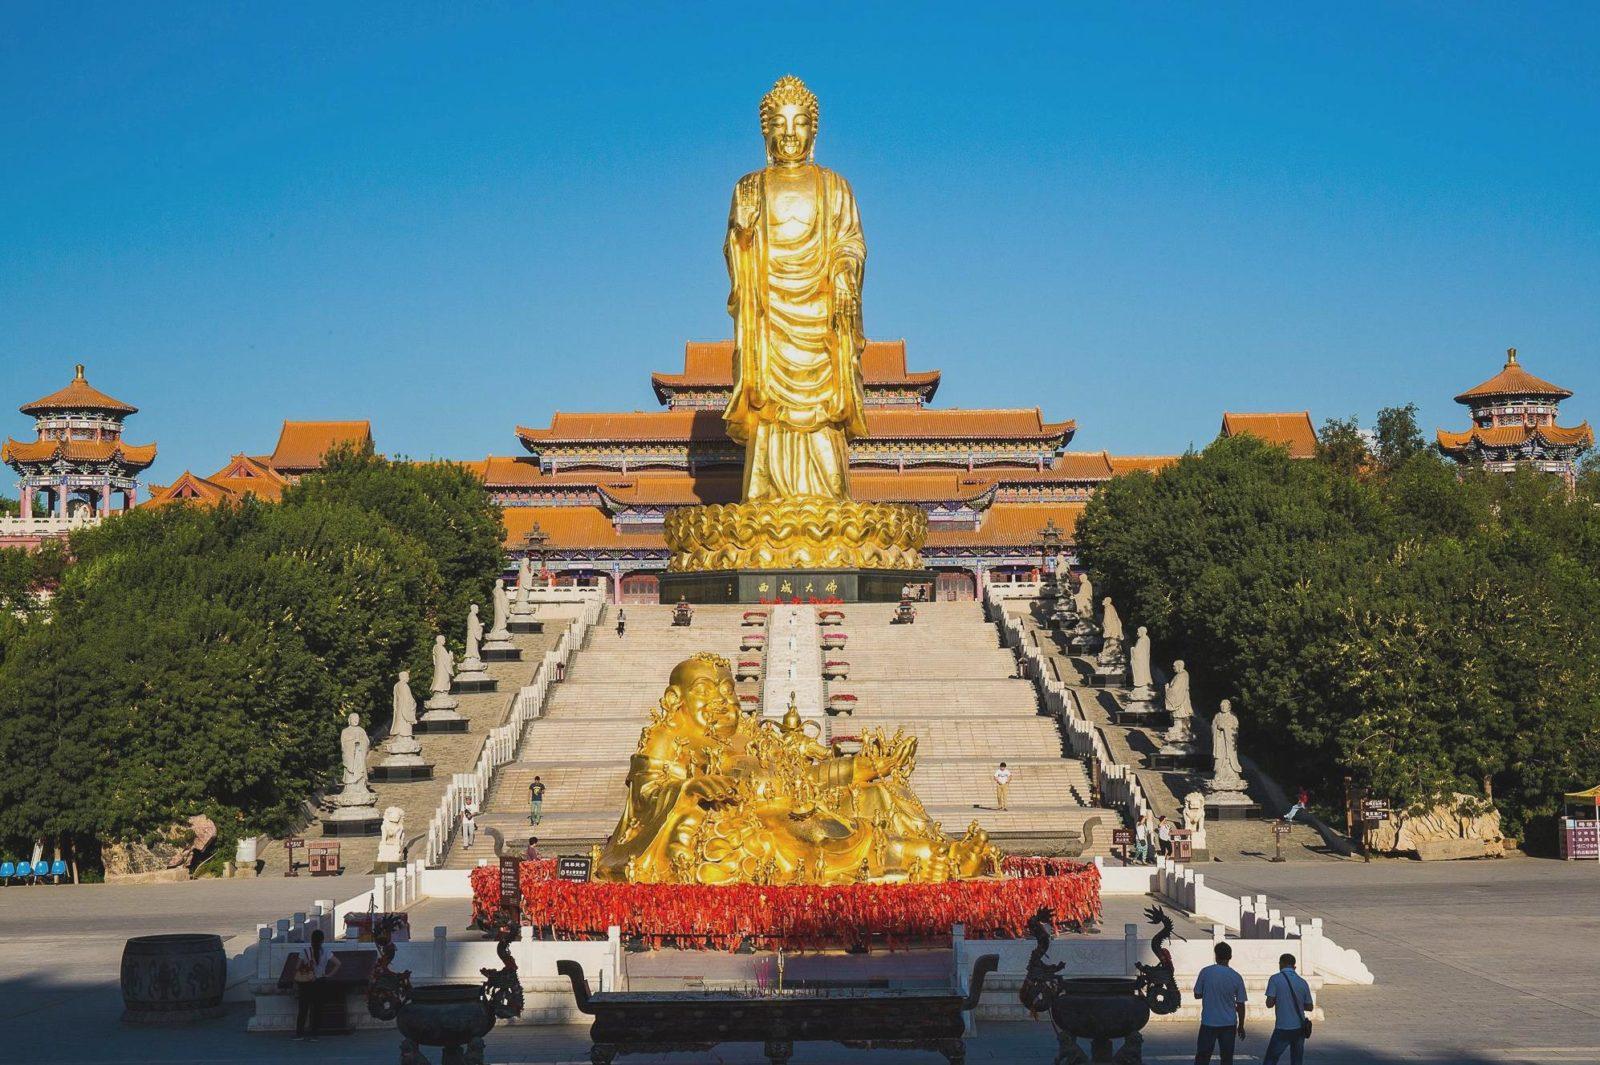 Буддийский храм Красного света, Урумчи, Синьцзян, Китай